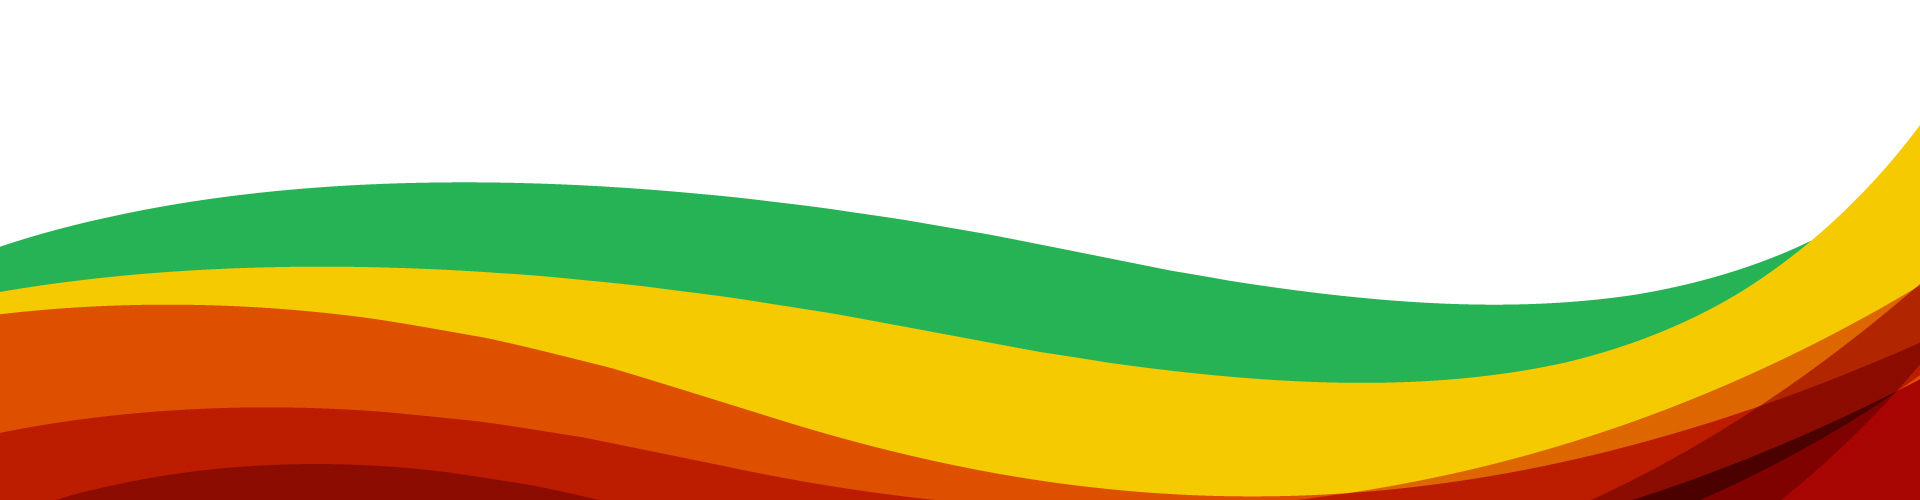 Schemi Elettrici Unifilari E Multifilari : Impianti progettazione consulenza navitas ingegneria novara